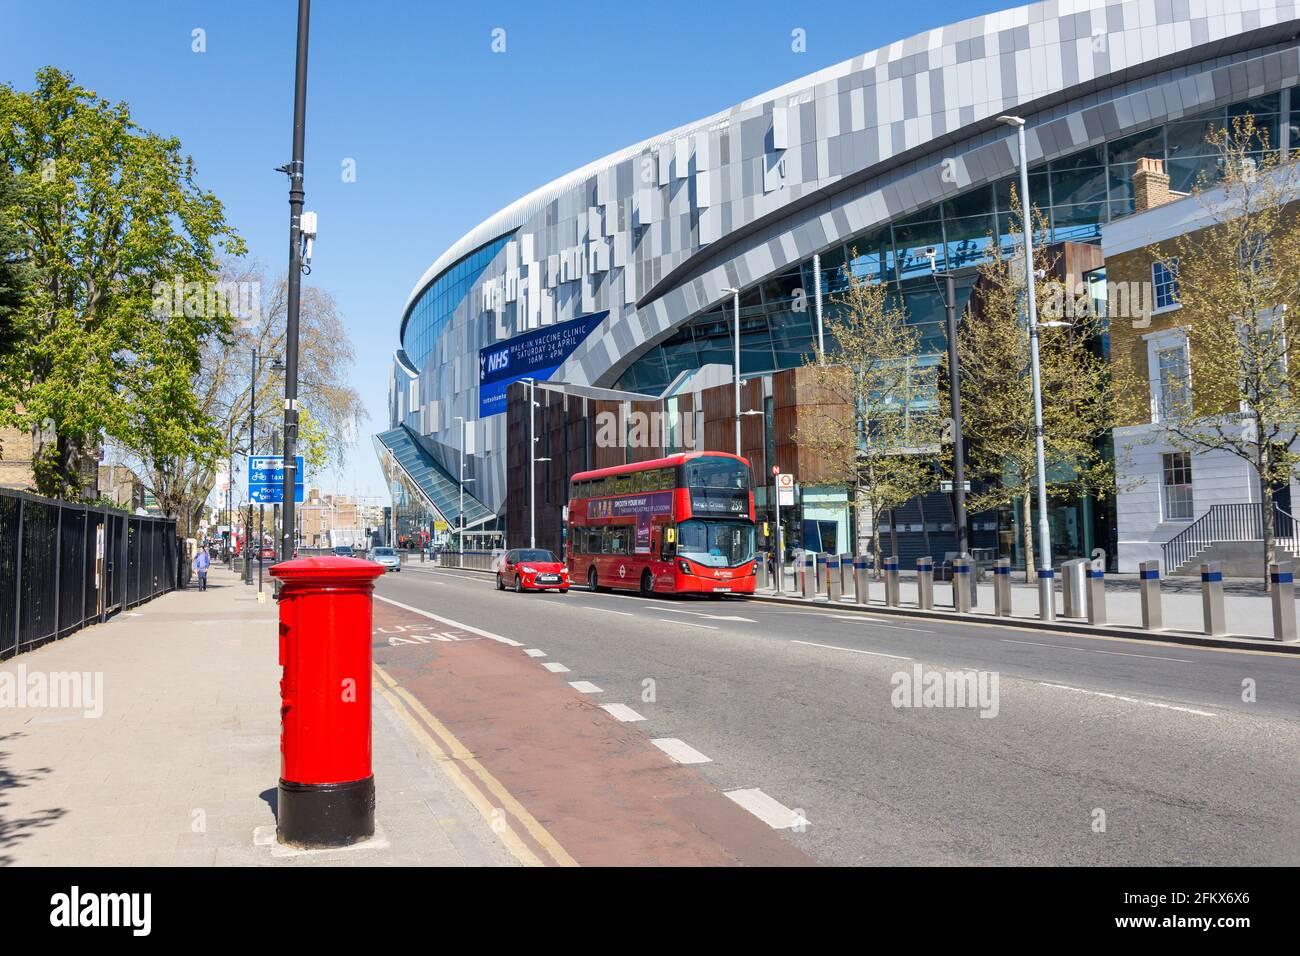 New White Hart Lane Stadium, High Street, Tottenham, London Borough of Haringey, Greater London, England, United Kingdom Stock Photo